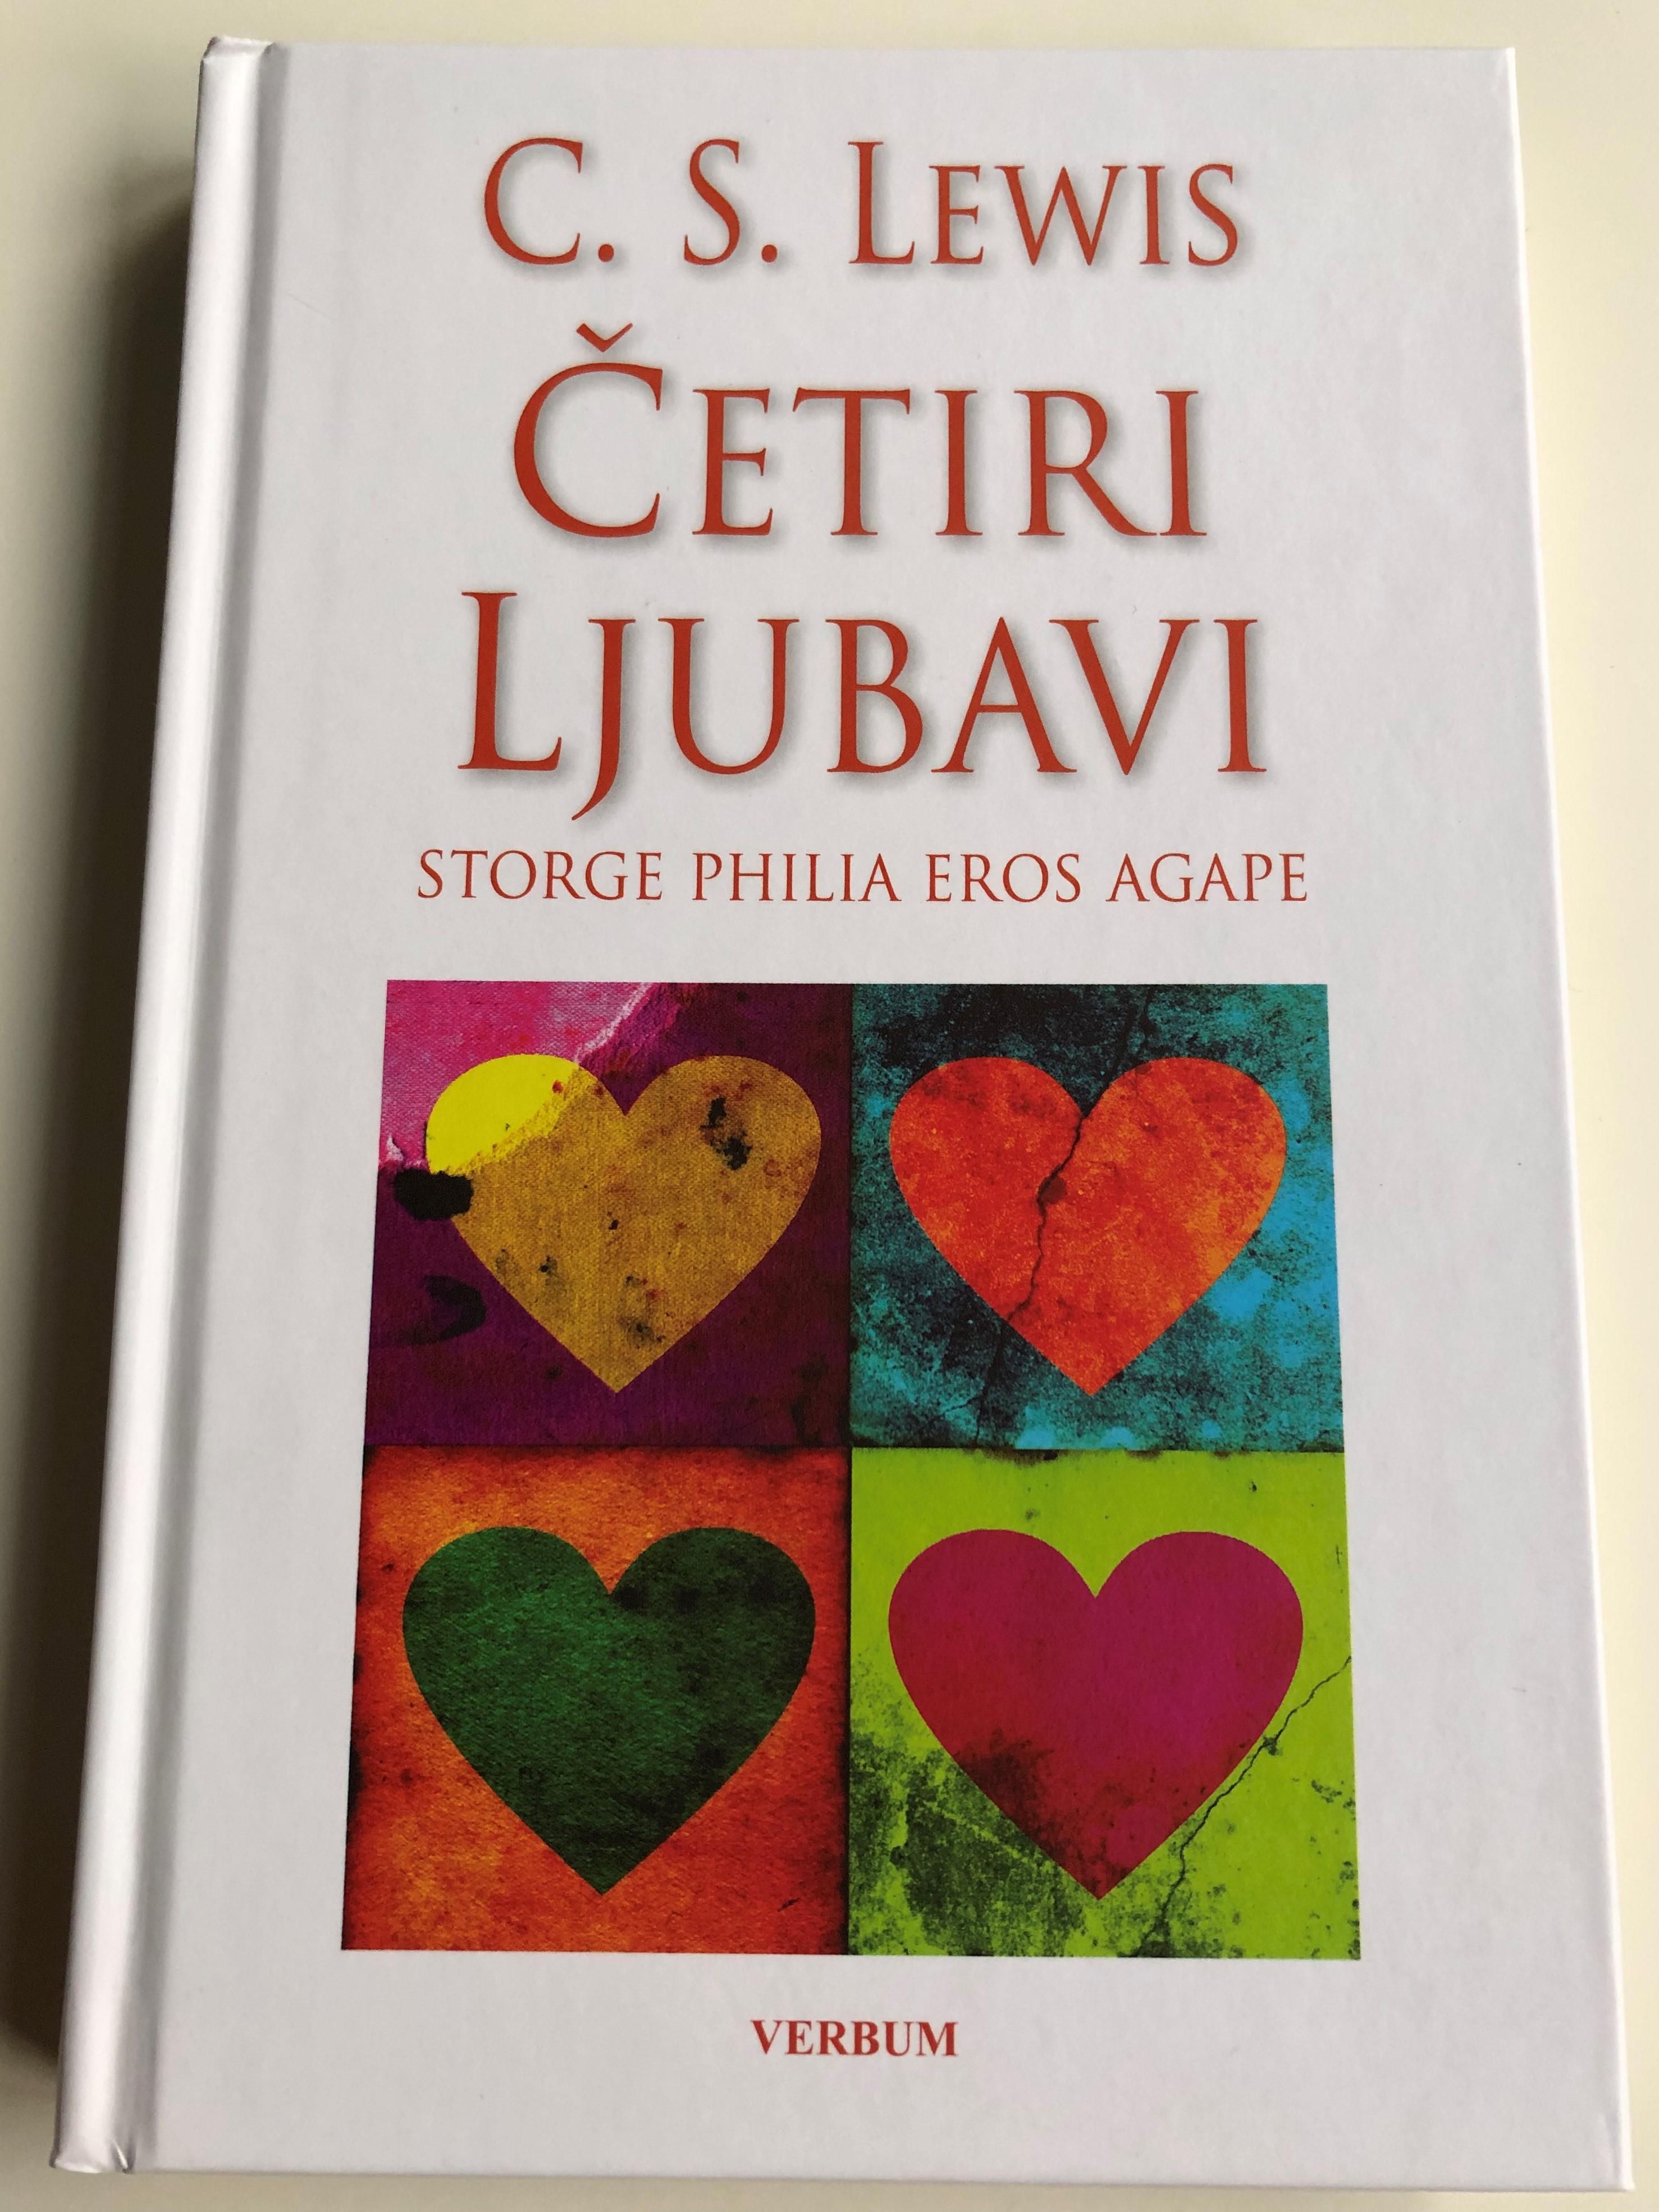 -etiri-ljubavi-by-c.-s.-lewis-storge-philia-eros-agape-1.jpg